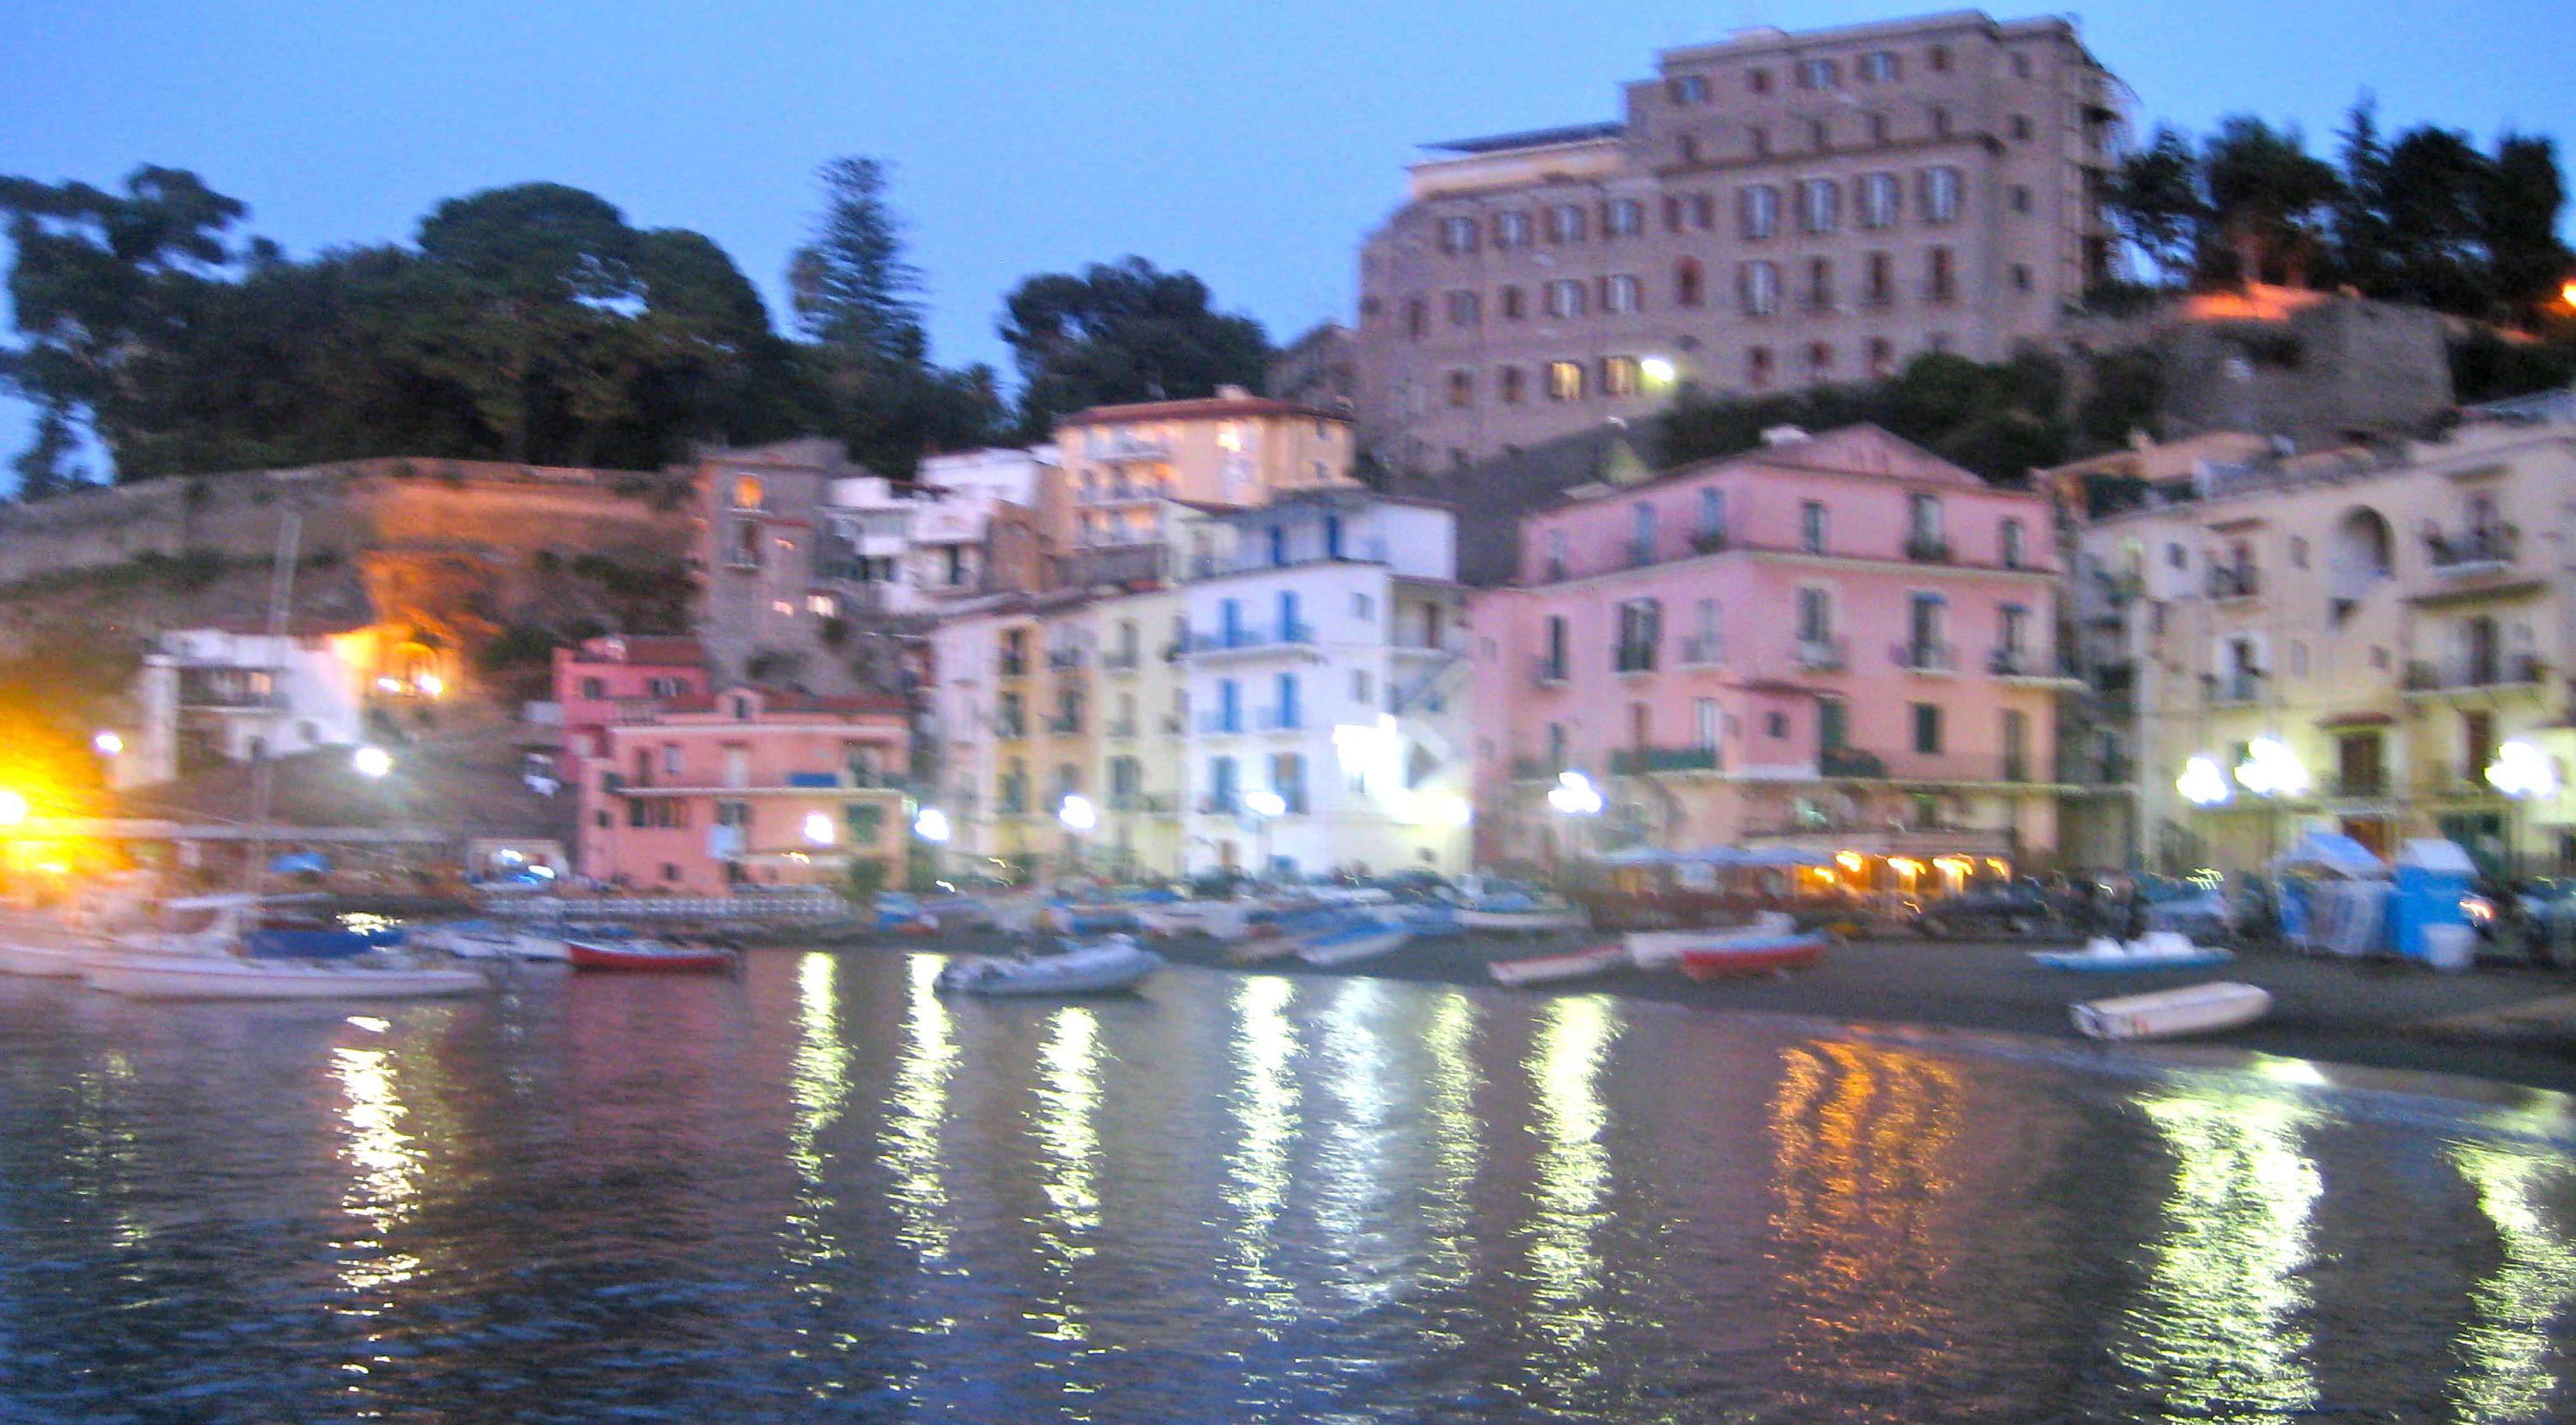 Sorrento, Italy...most fav pic I've taken!